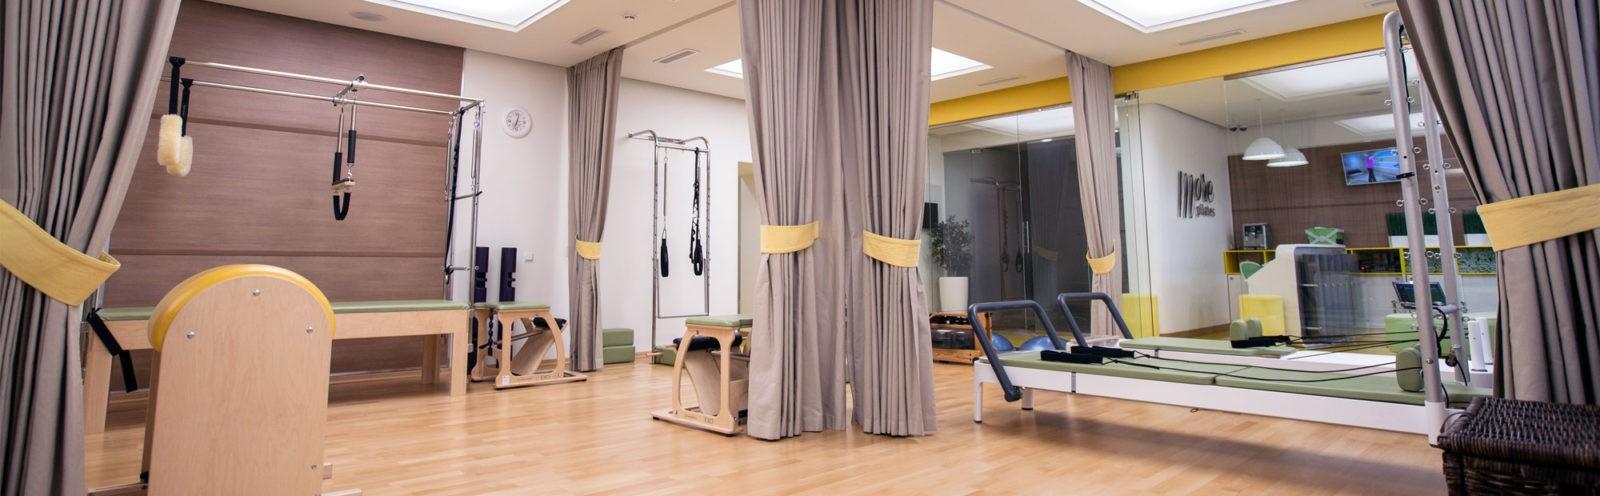 студия MORE Pilates - программа франчайзинга